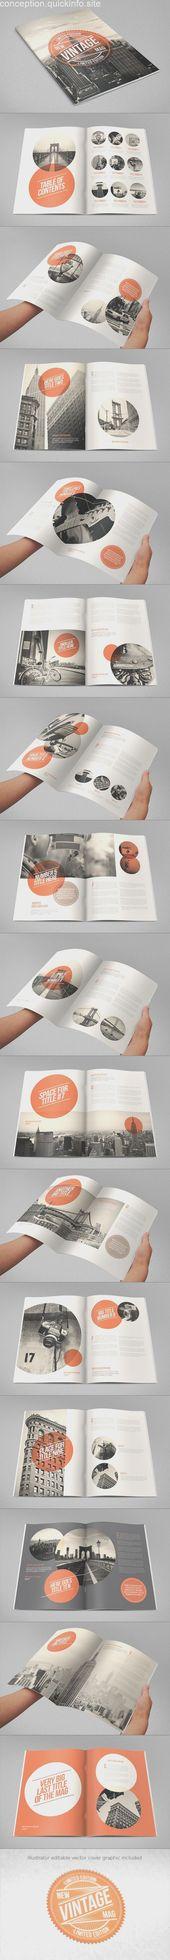 Revista Cool Vintage Retro. Descargar aquí: graphicriver.net / … #magazine #desi …   – Magazine Design